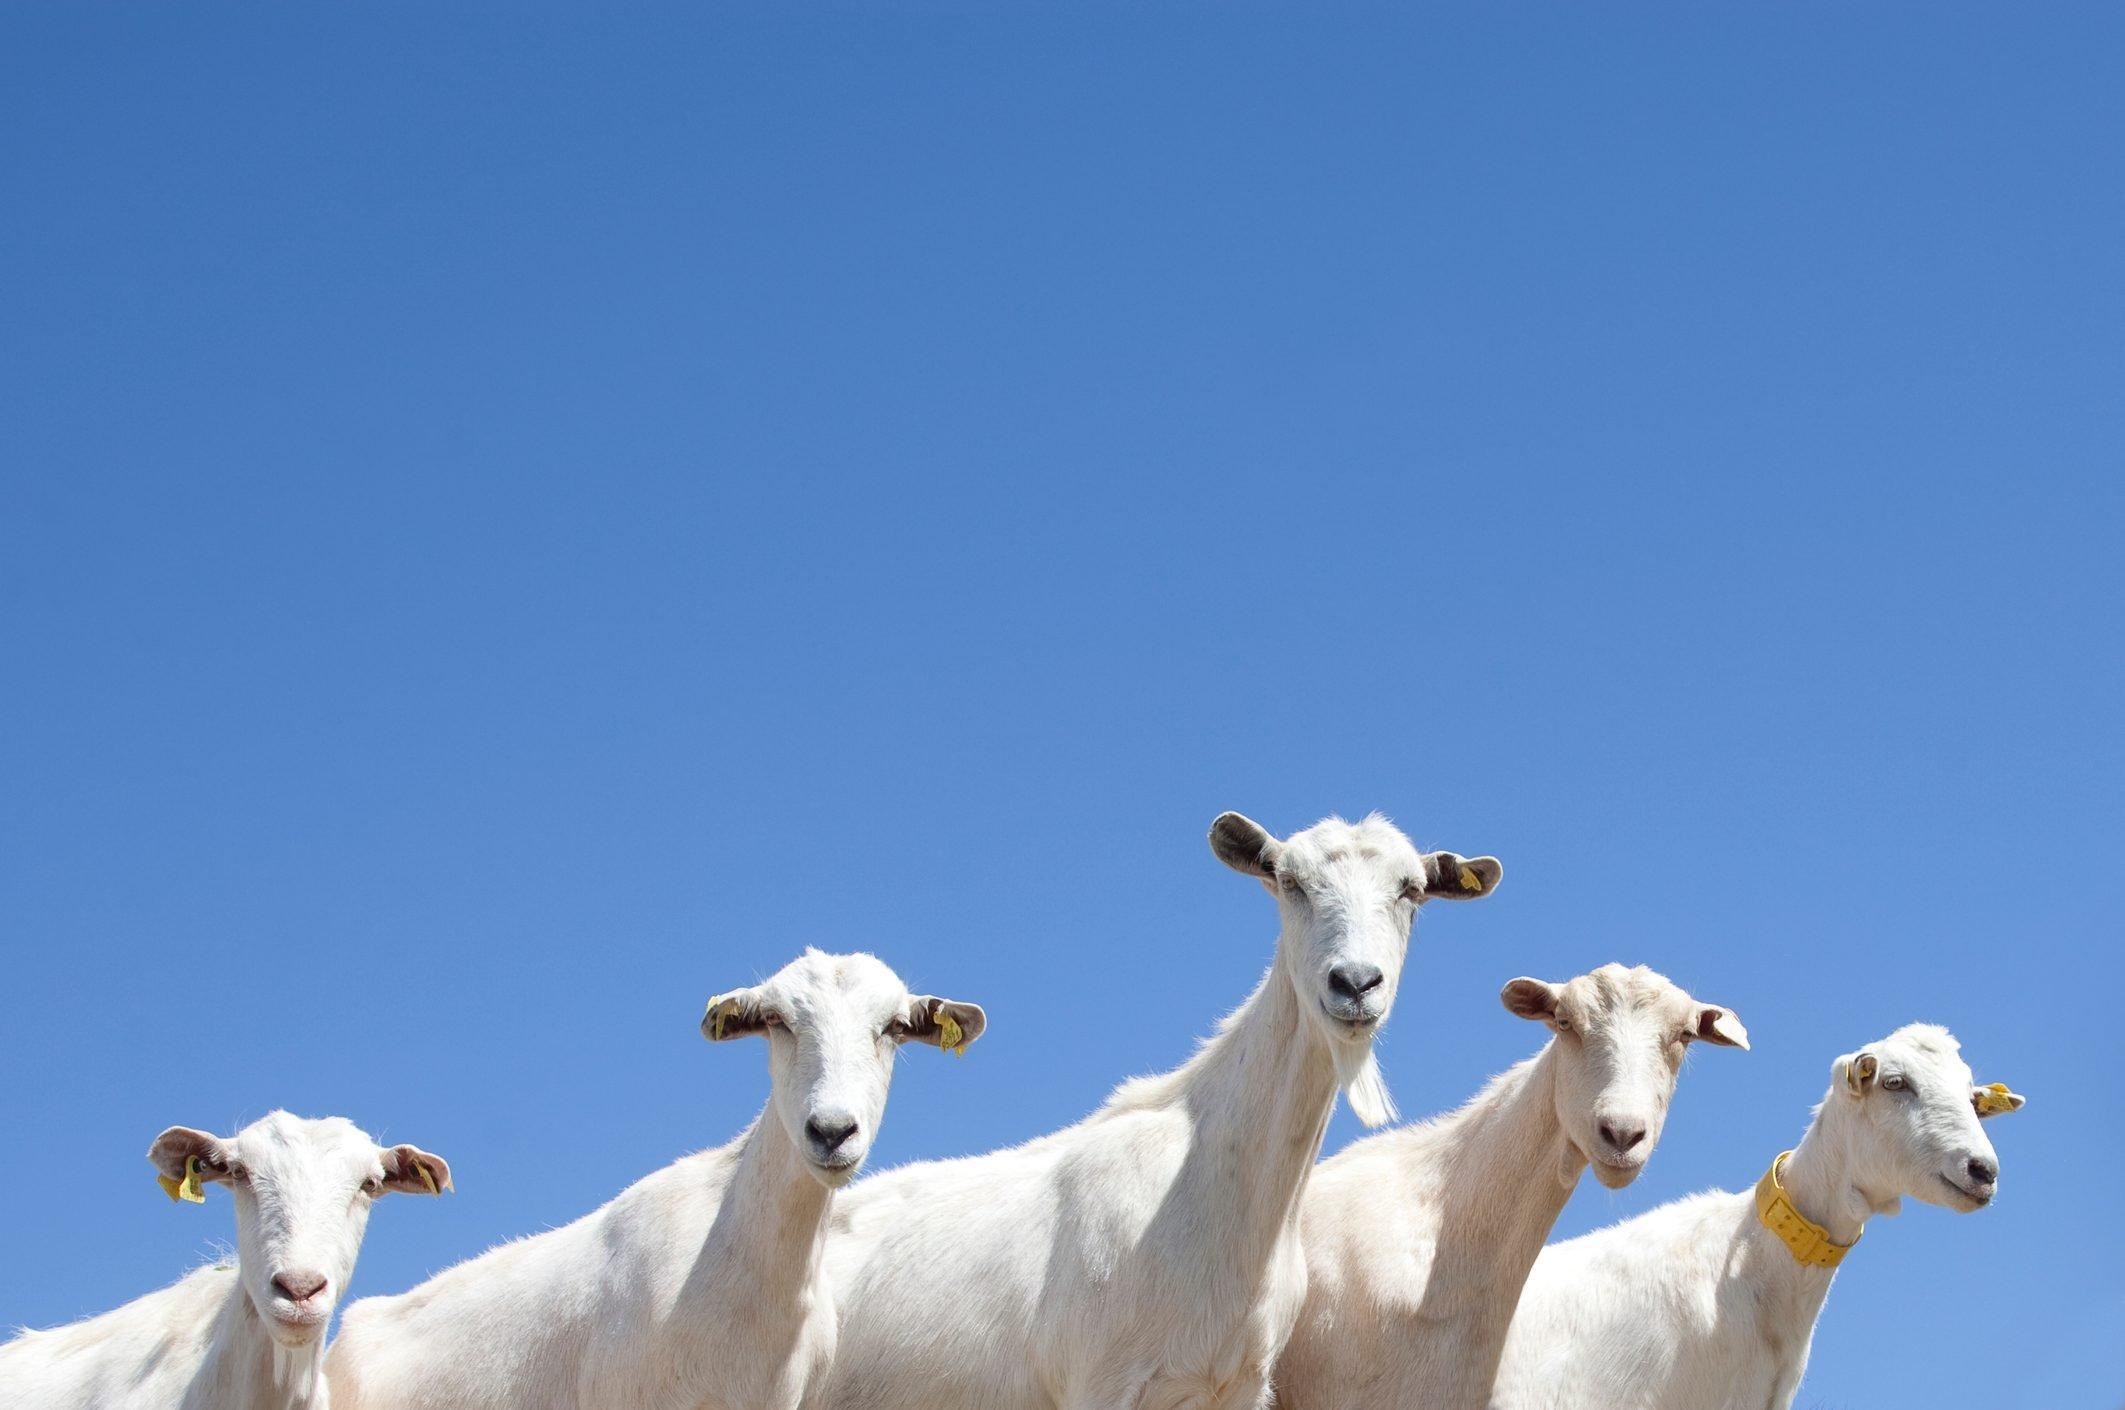 Goats staring.